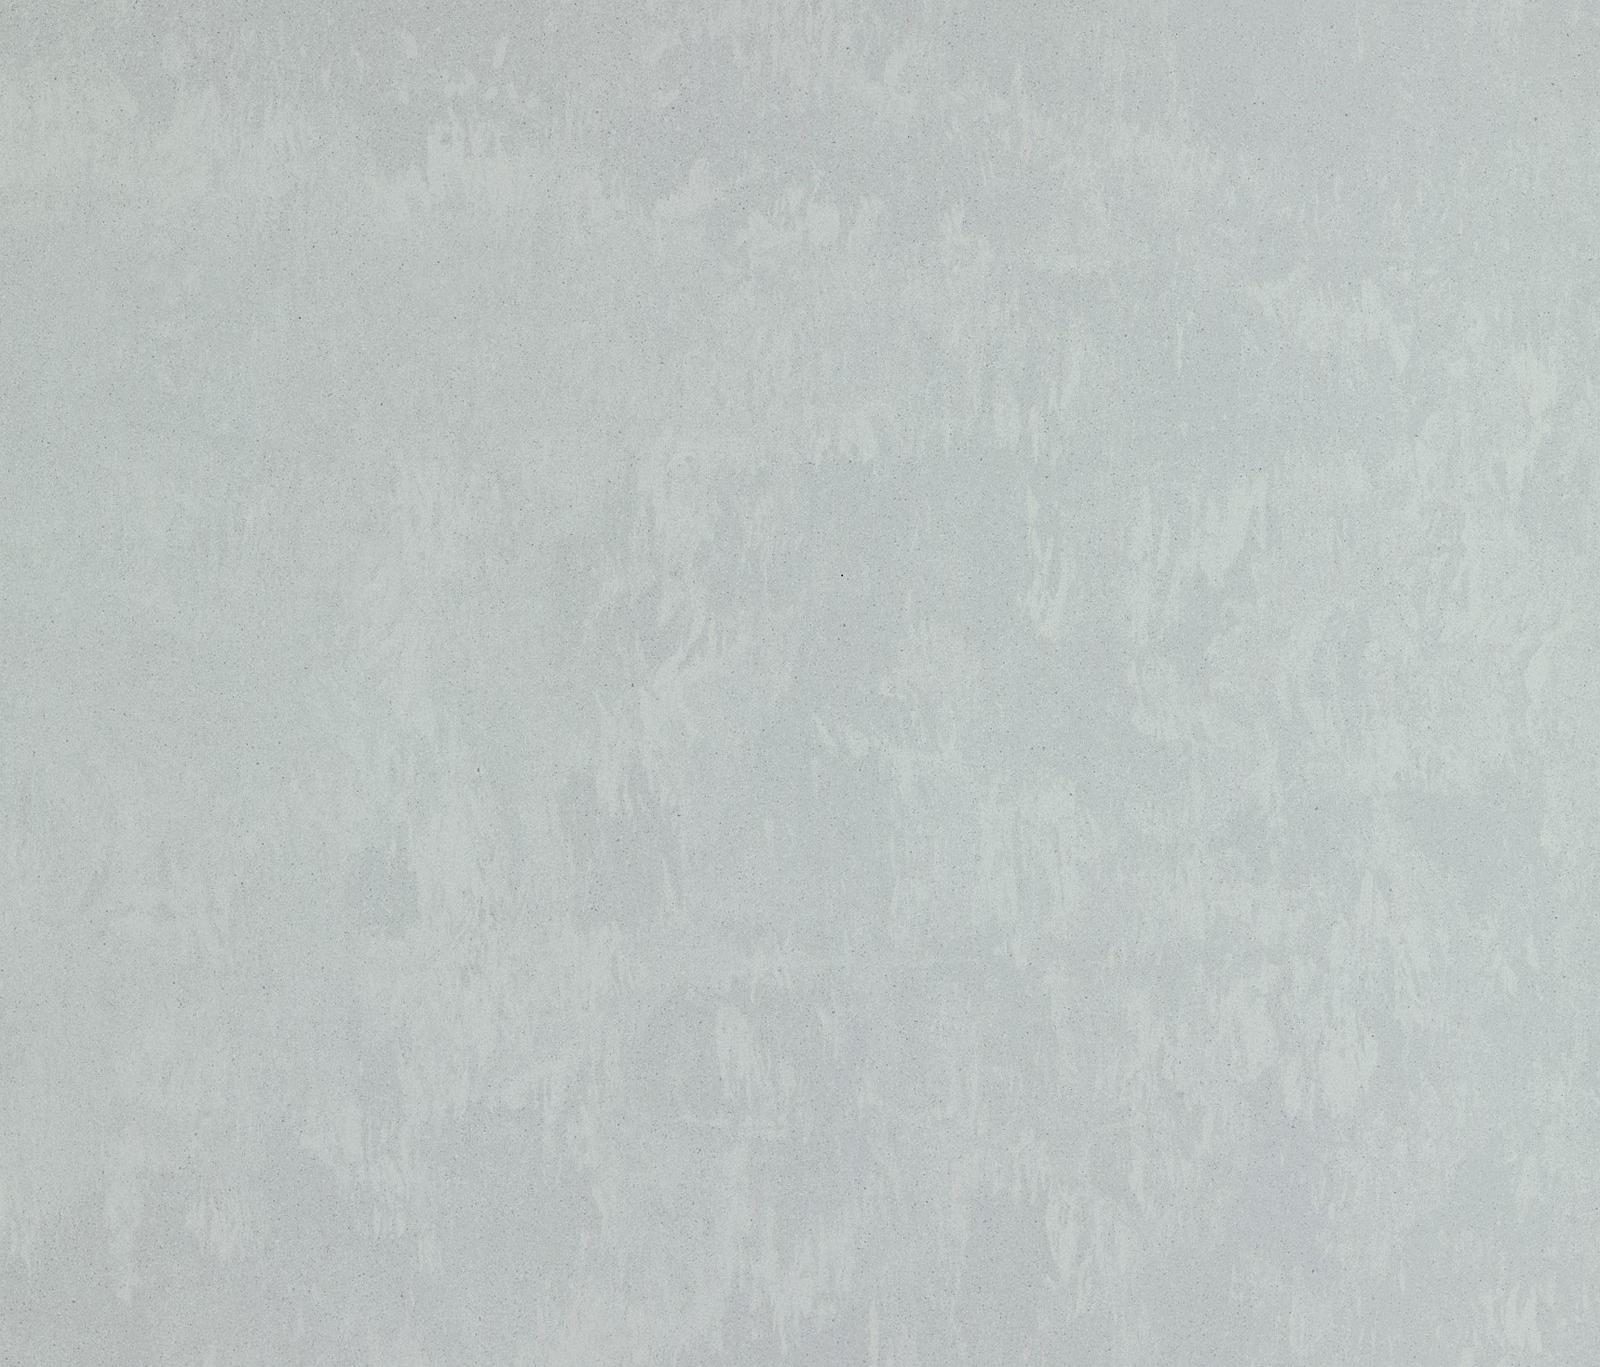 Sistem n neutro grigio chiaro levigato carrelage pour for Carrelage groupe 4